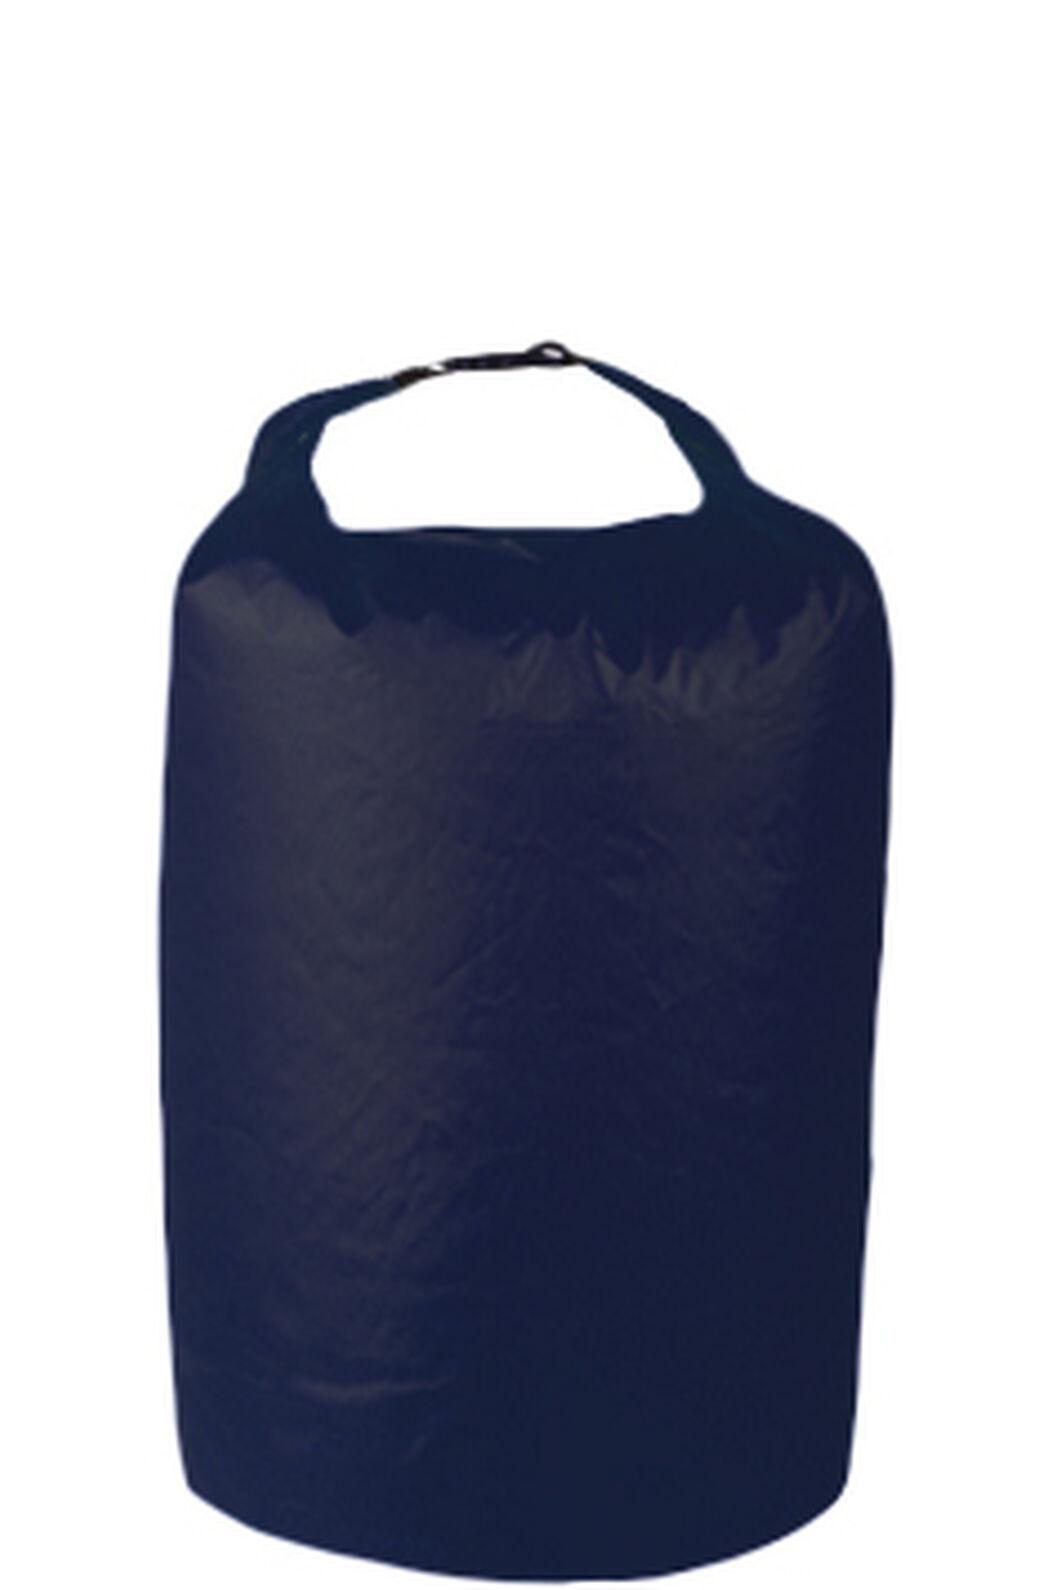 Macpac Ultralight Dry Bag 15 L, Sodalite Blue, hi-res